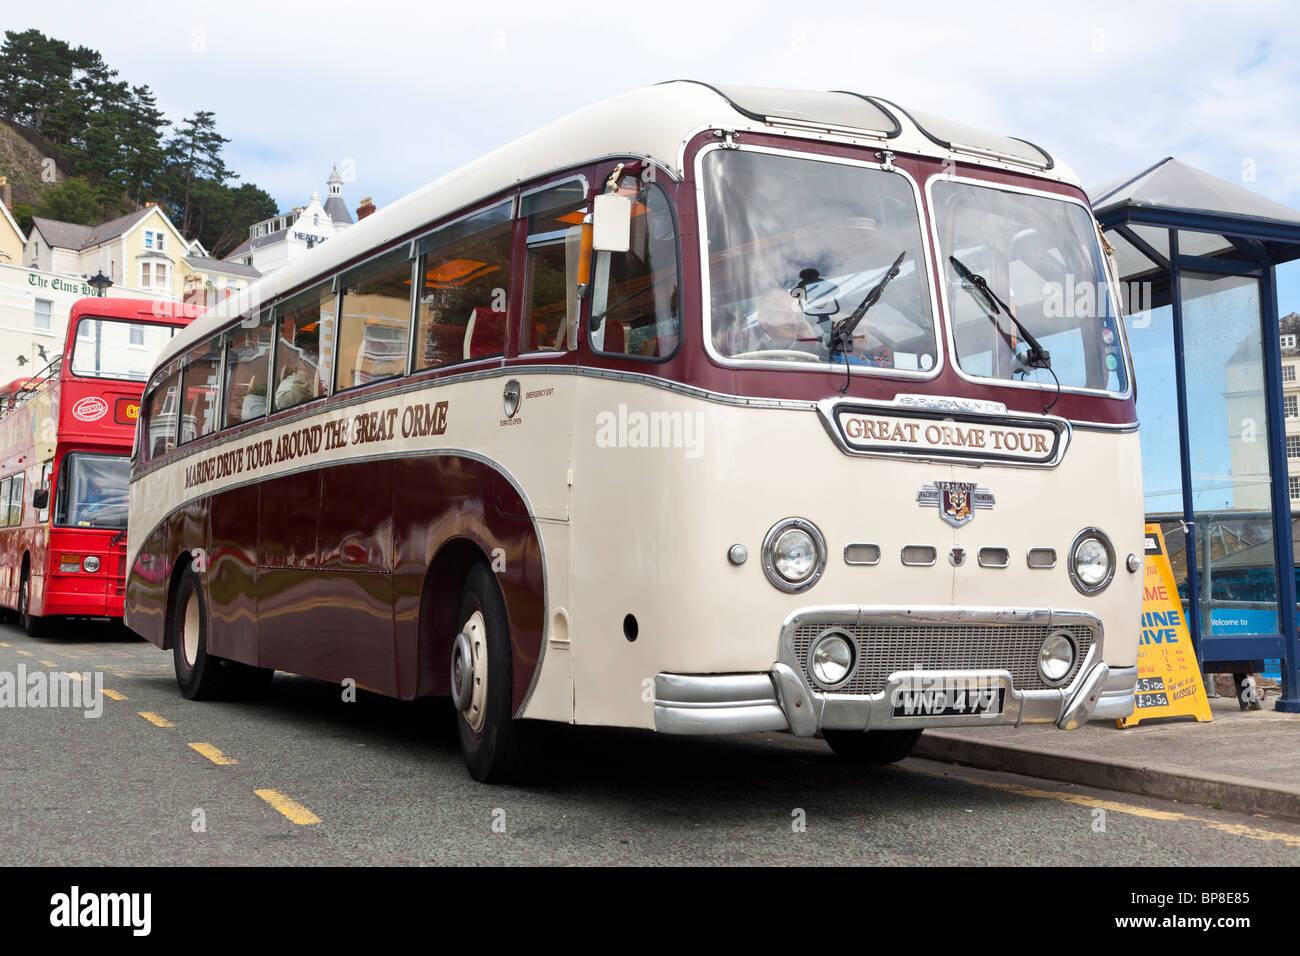 Great Orme Tour, 1950s Leyland bus, Llandudno, North Wales - Stock Image